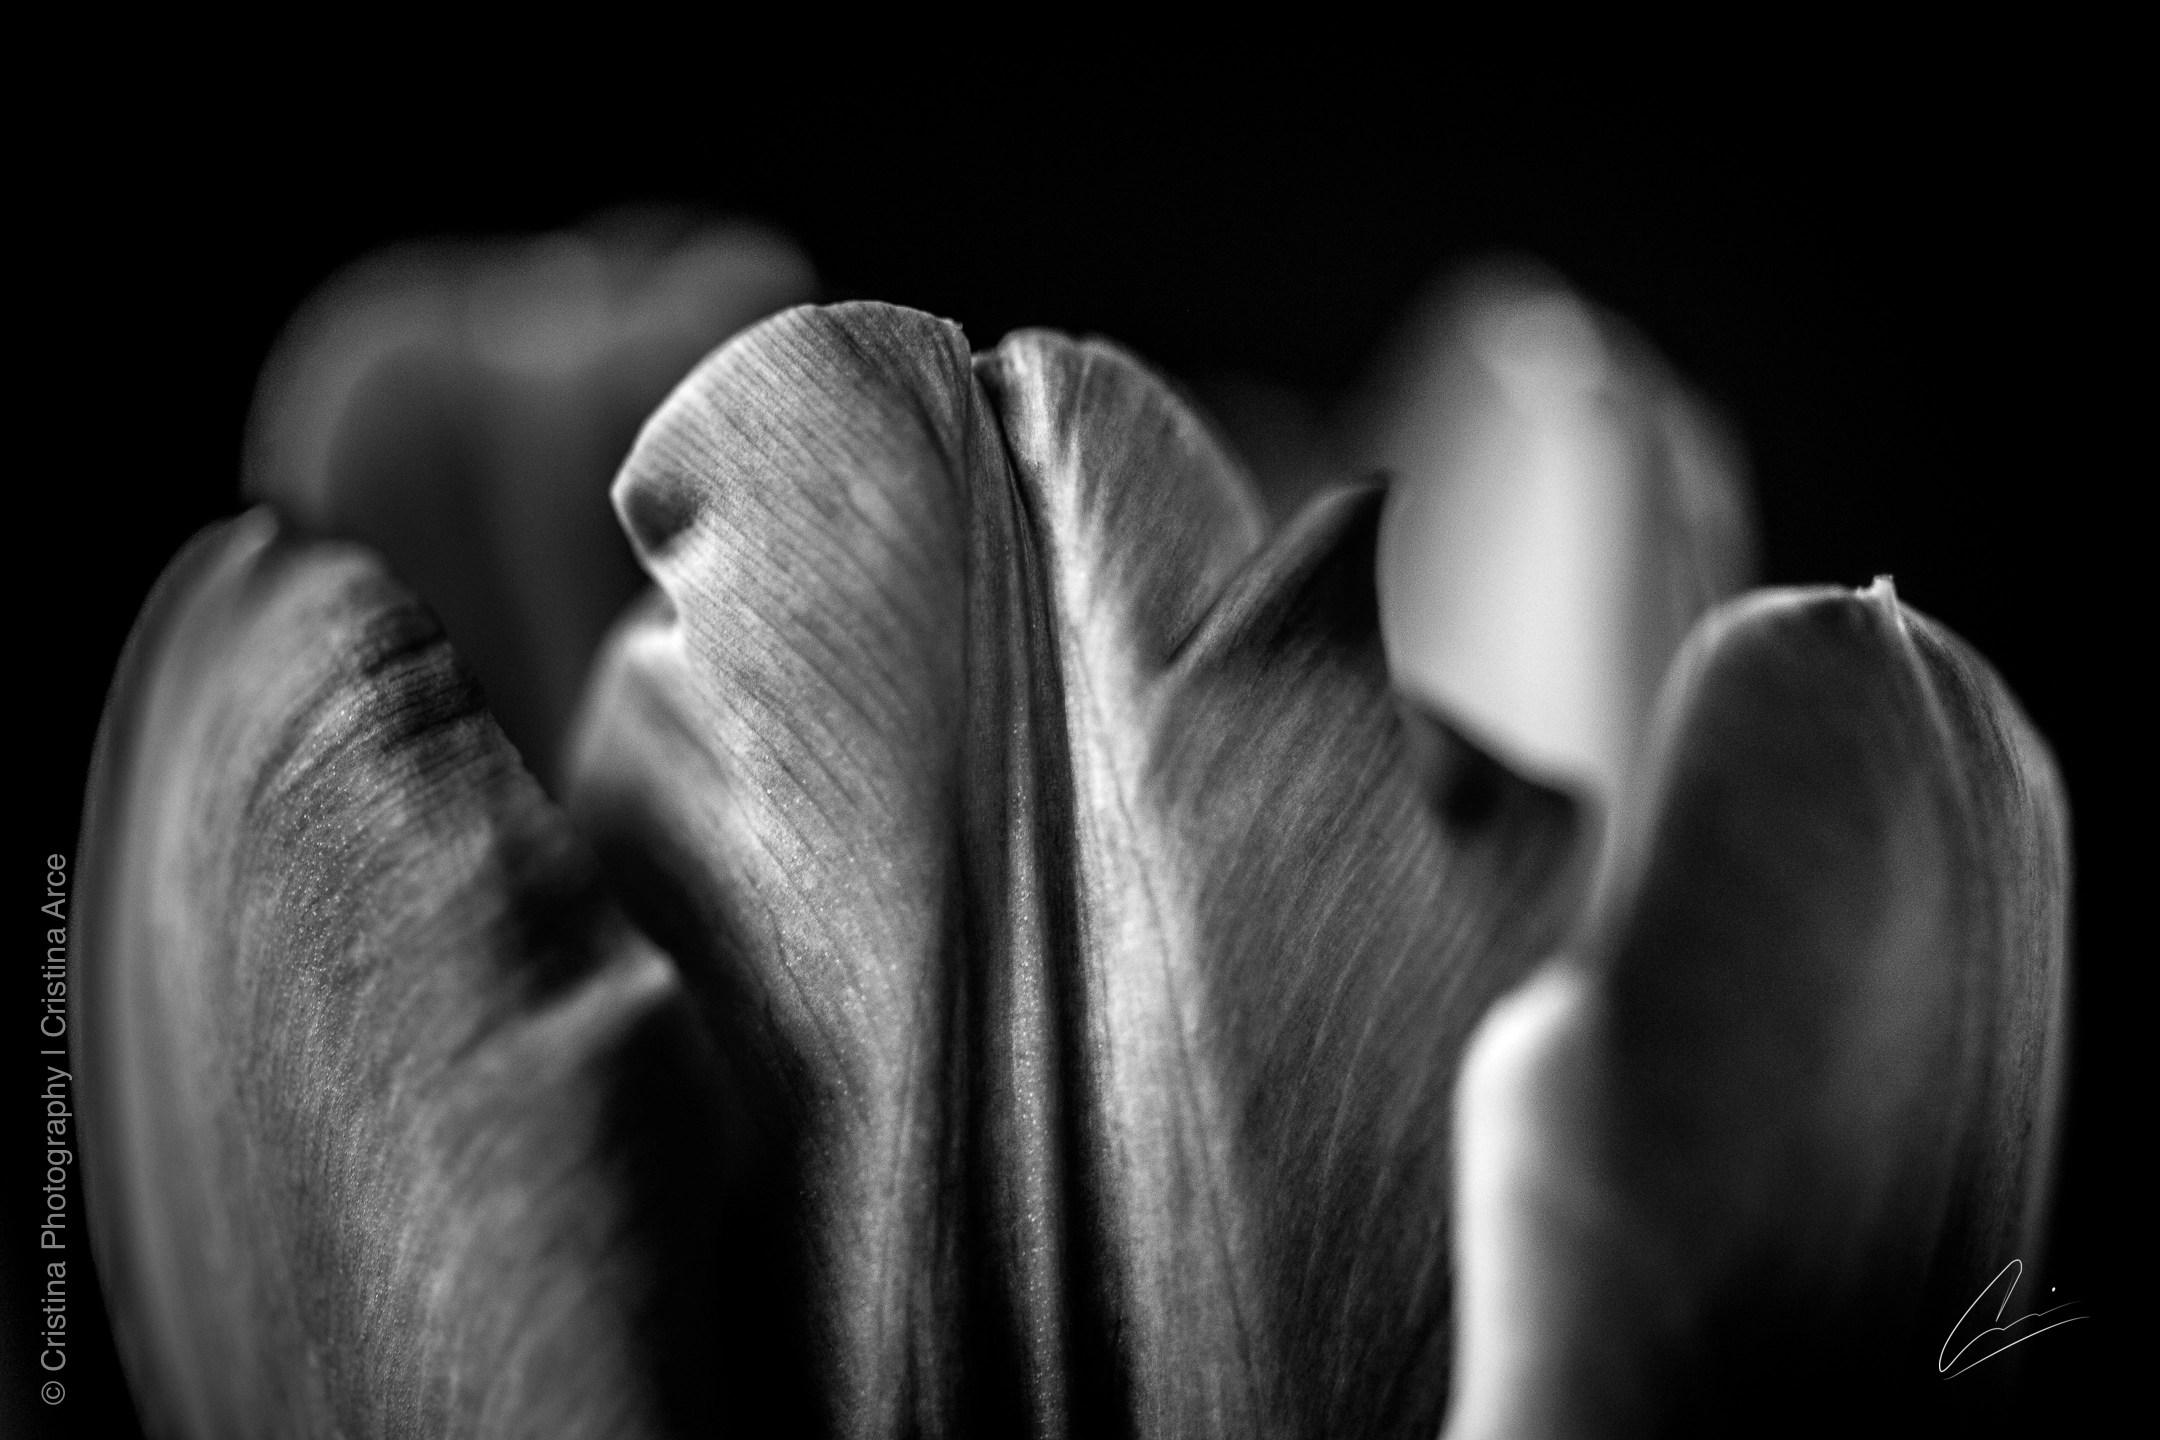 © CRISTINA PHOTOGRAPHY | CRISTINA ARCE